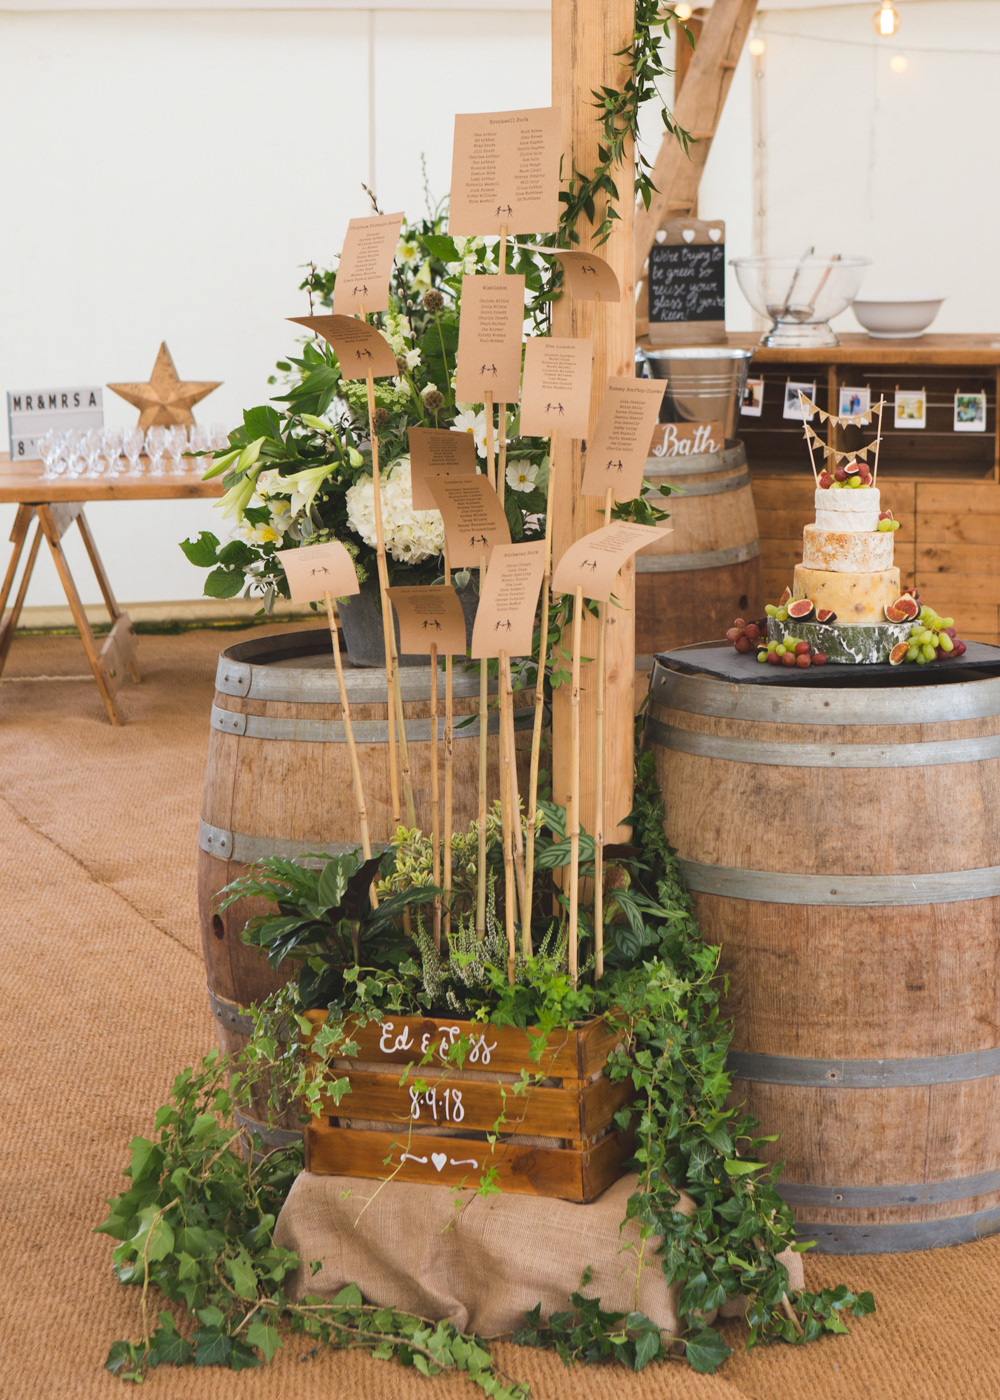 Seating Plan Table Chart Sticks Wooden Barrels Crate Greenery Foliage Airbnb Wedding Pickavance Weddings